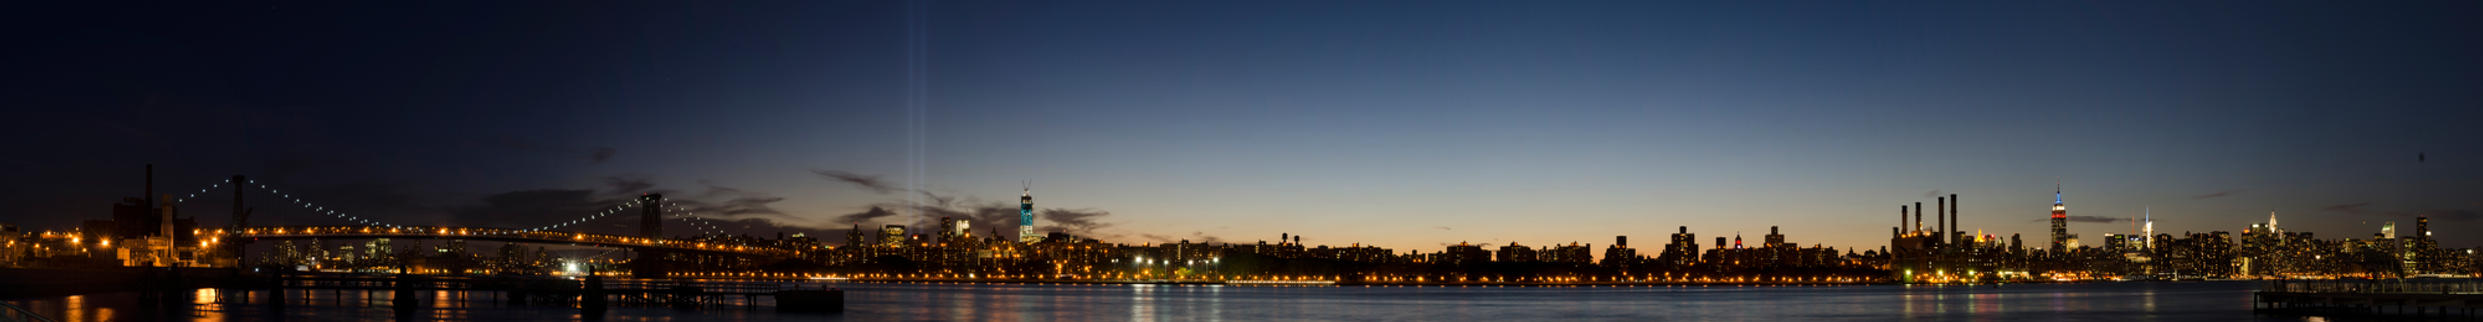 New York, New York by MarcAndrePhoto